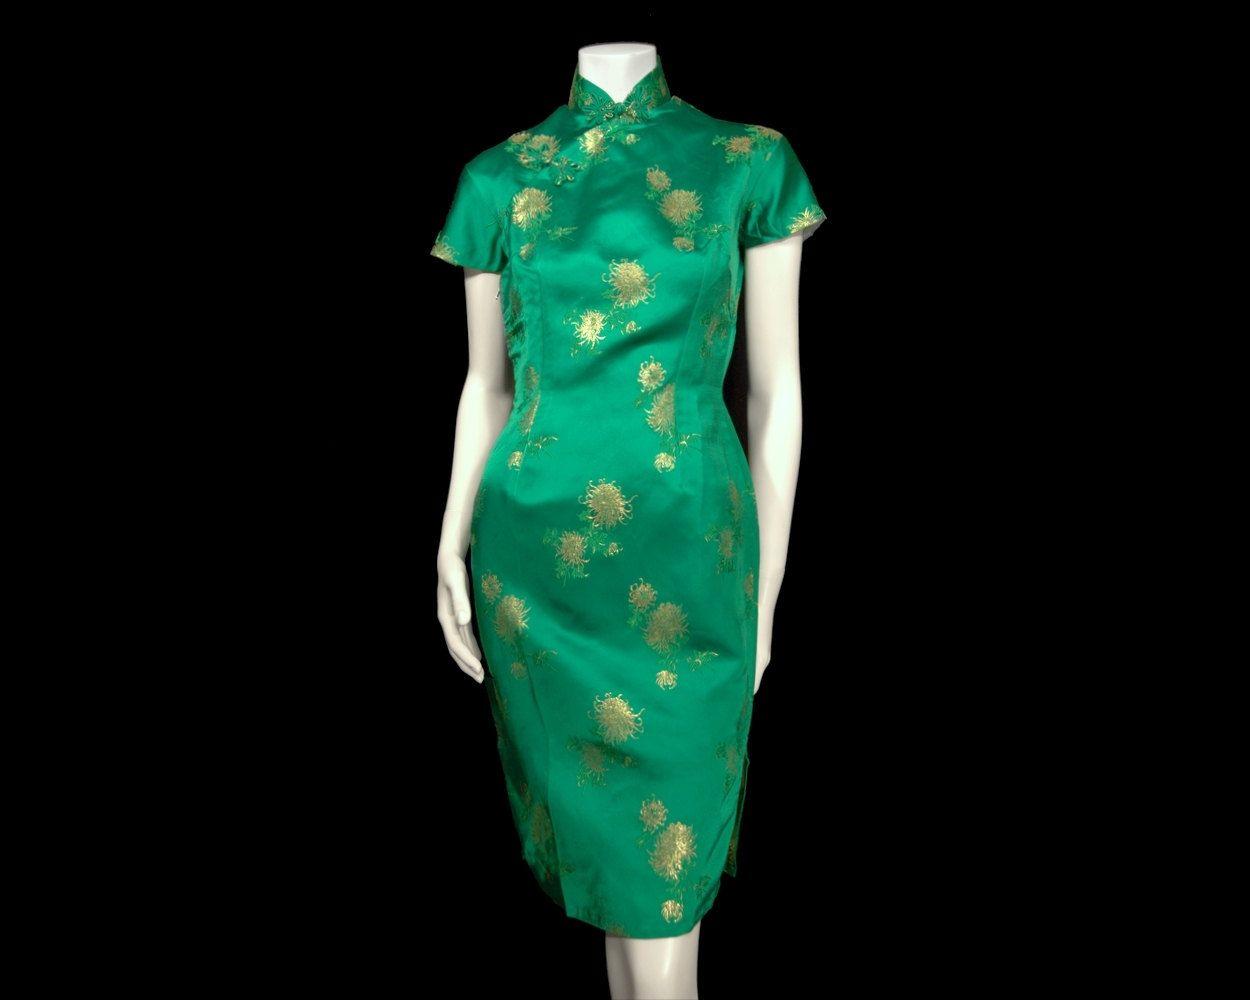 Vintage Emerald Green Qipao Cheongsam Dress sz S Gold Chrysanthemum ...